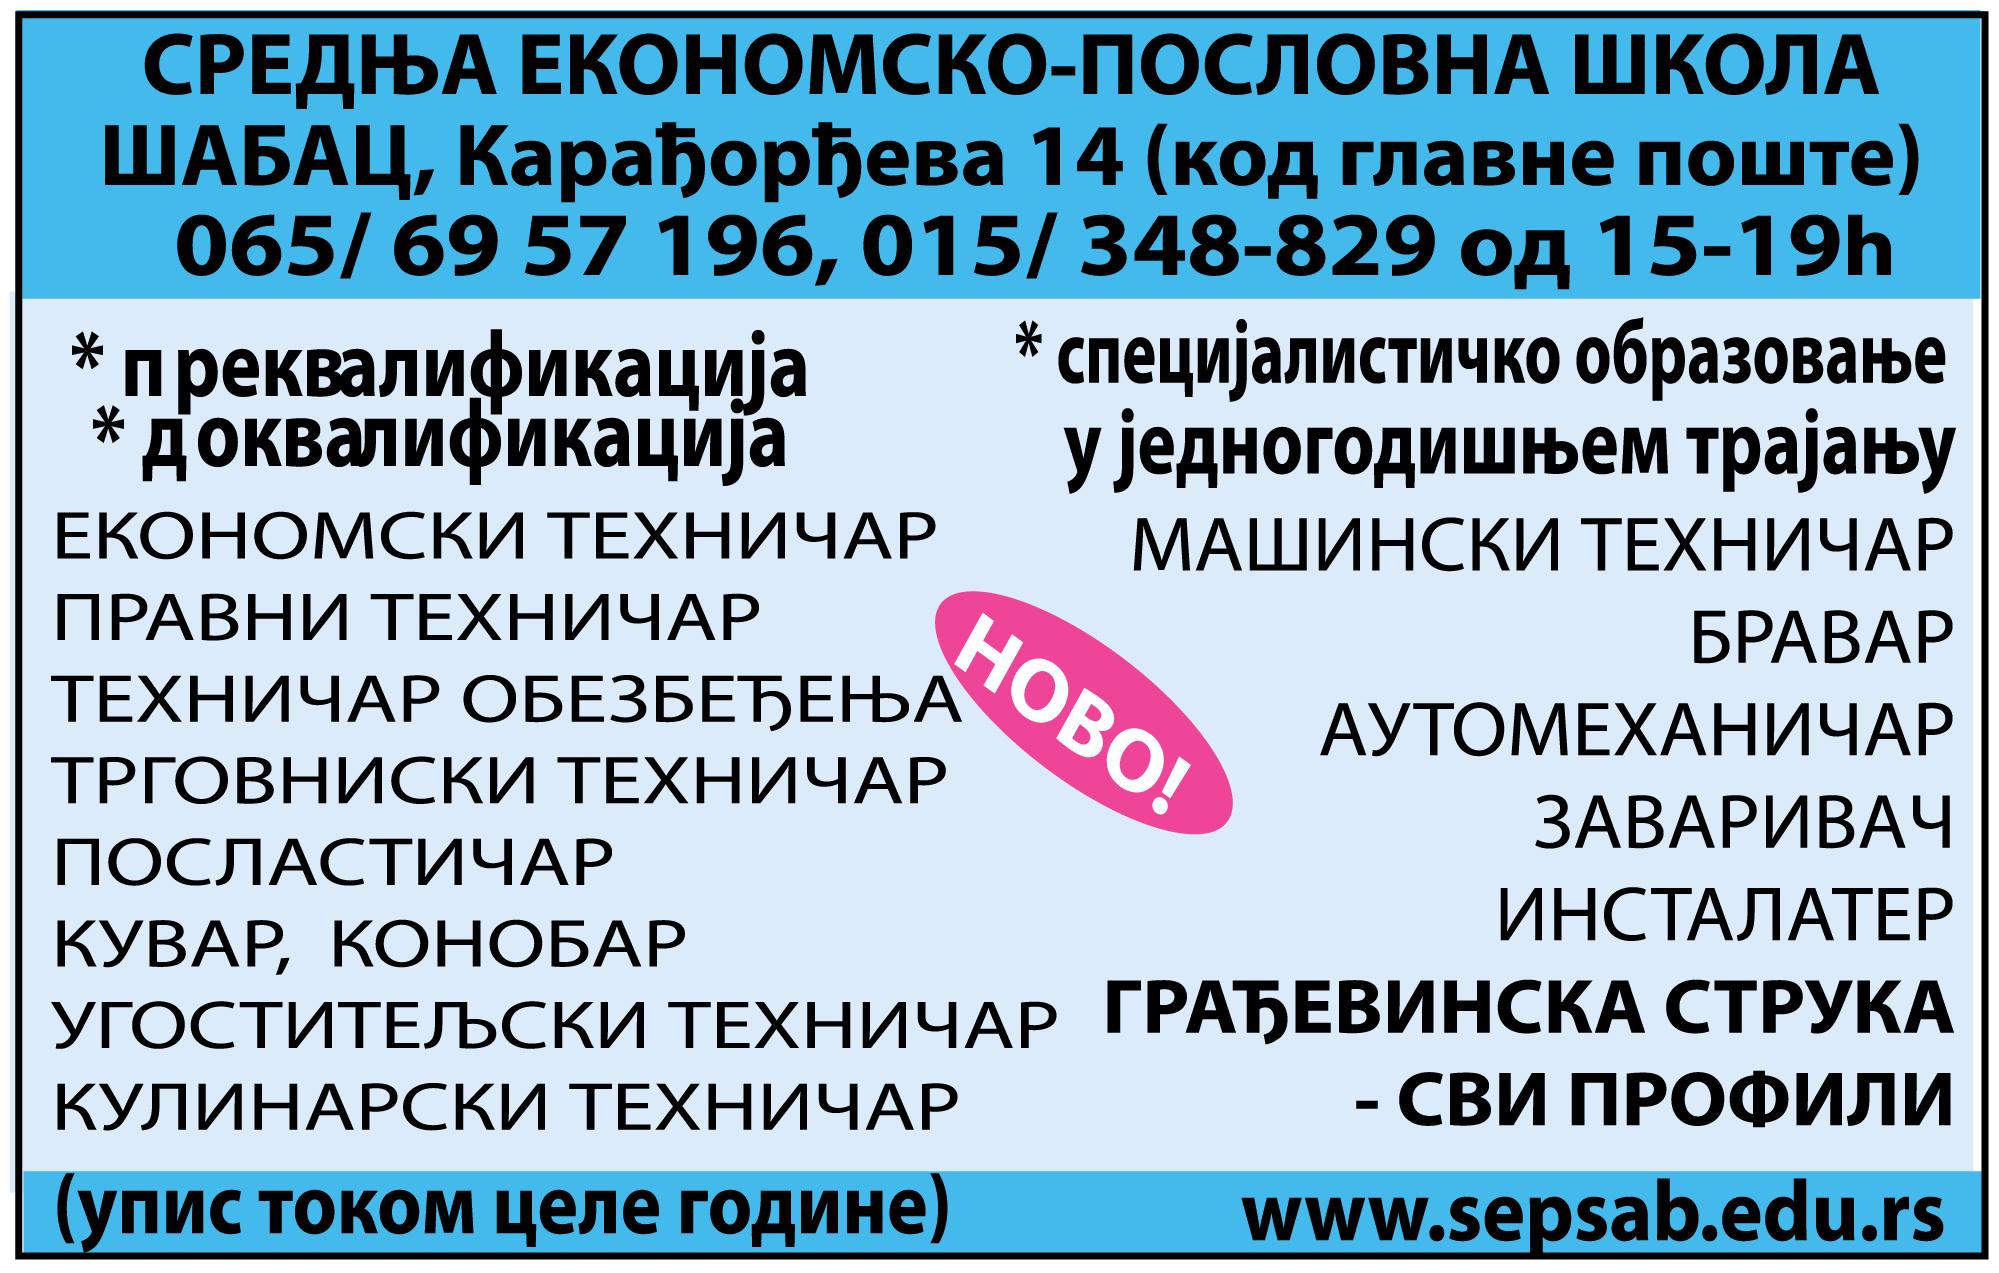 srednjaskola-strukovna- visaskola-sabac-kursevi-prekvalifikacija-dokvalifikacija-fakultet-studije-edukacija-doskolovavanje